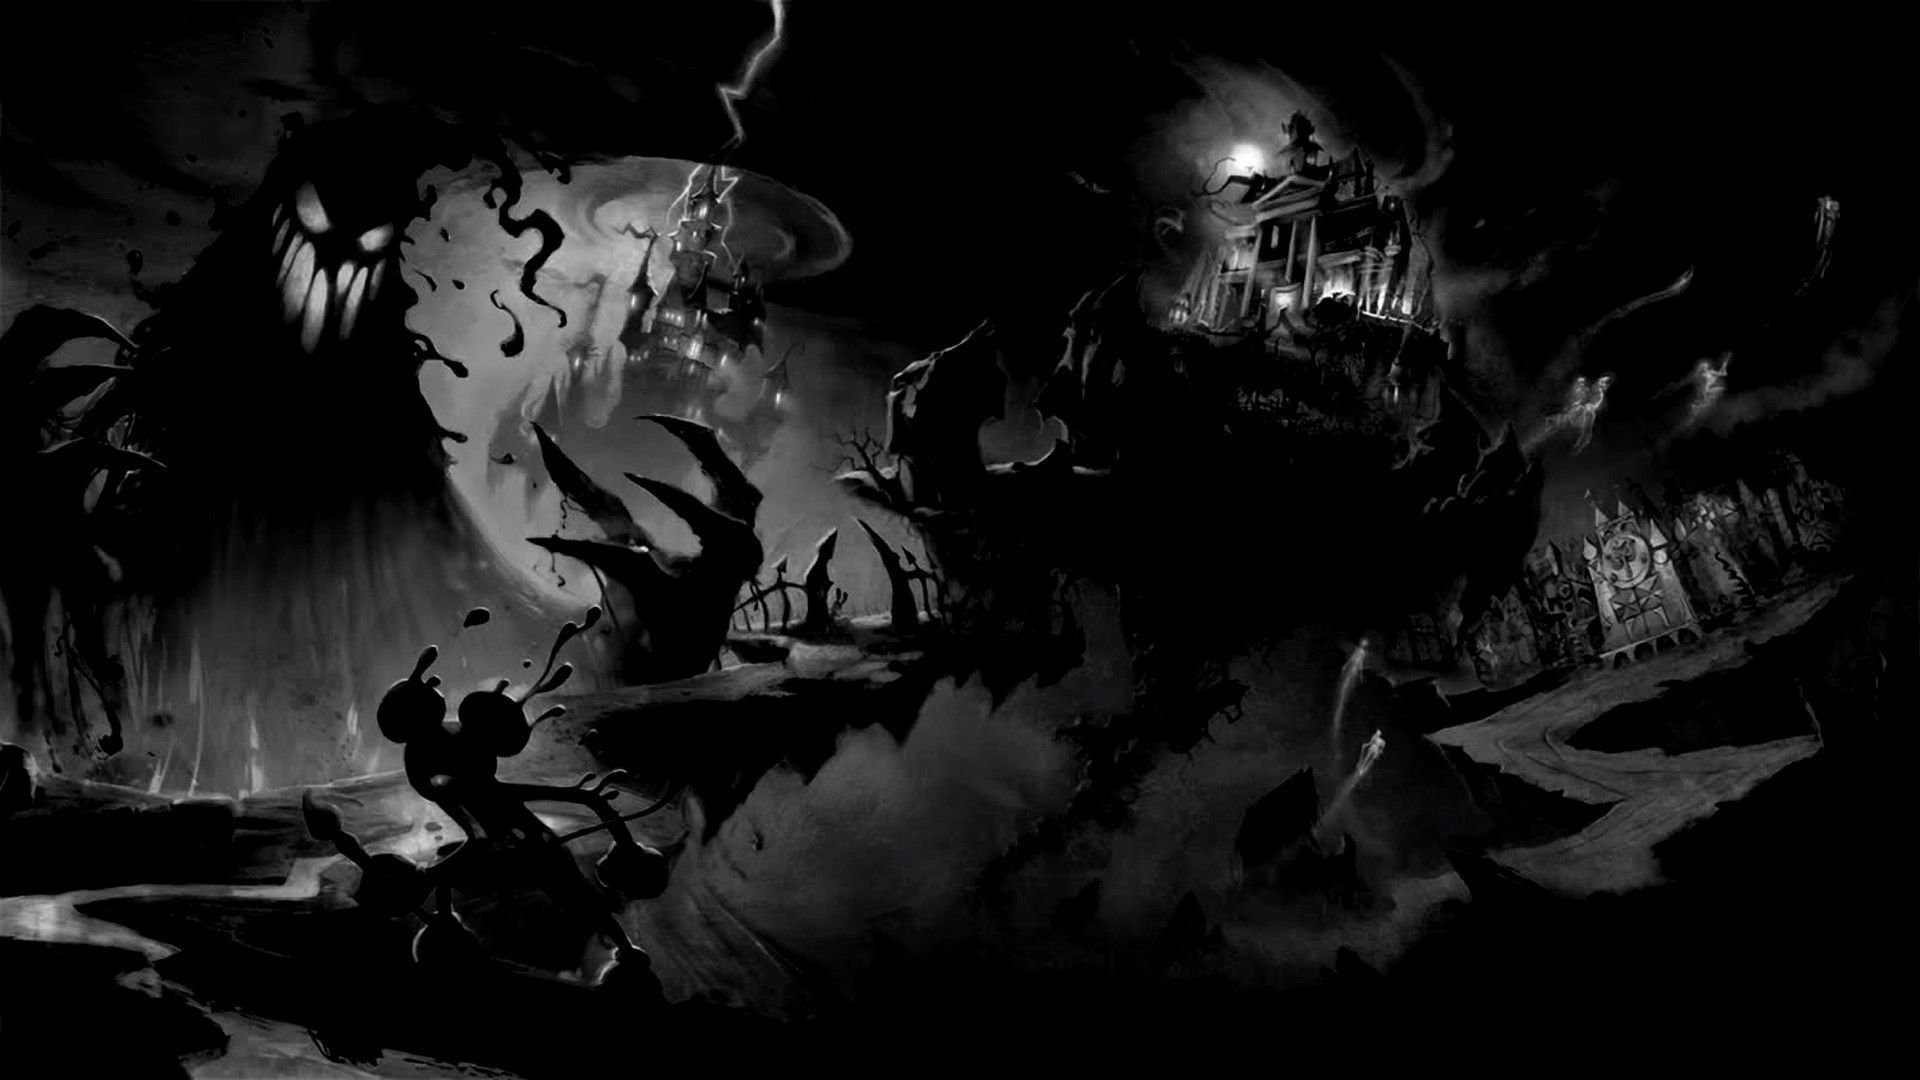 1920x1080 Scary Halloween Backgrounds Wallpapers Zone Desktop Background 1920x1200